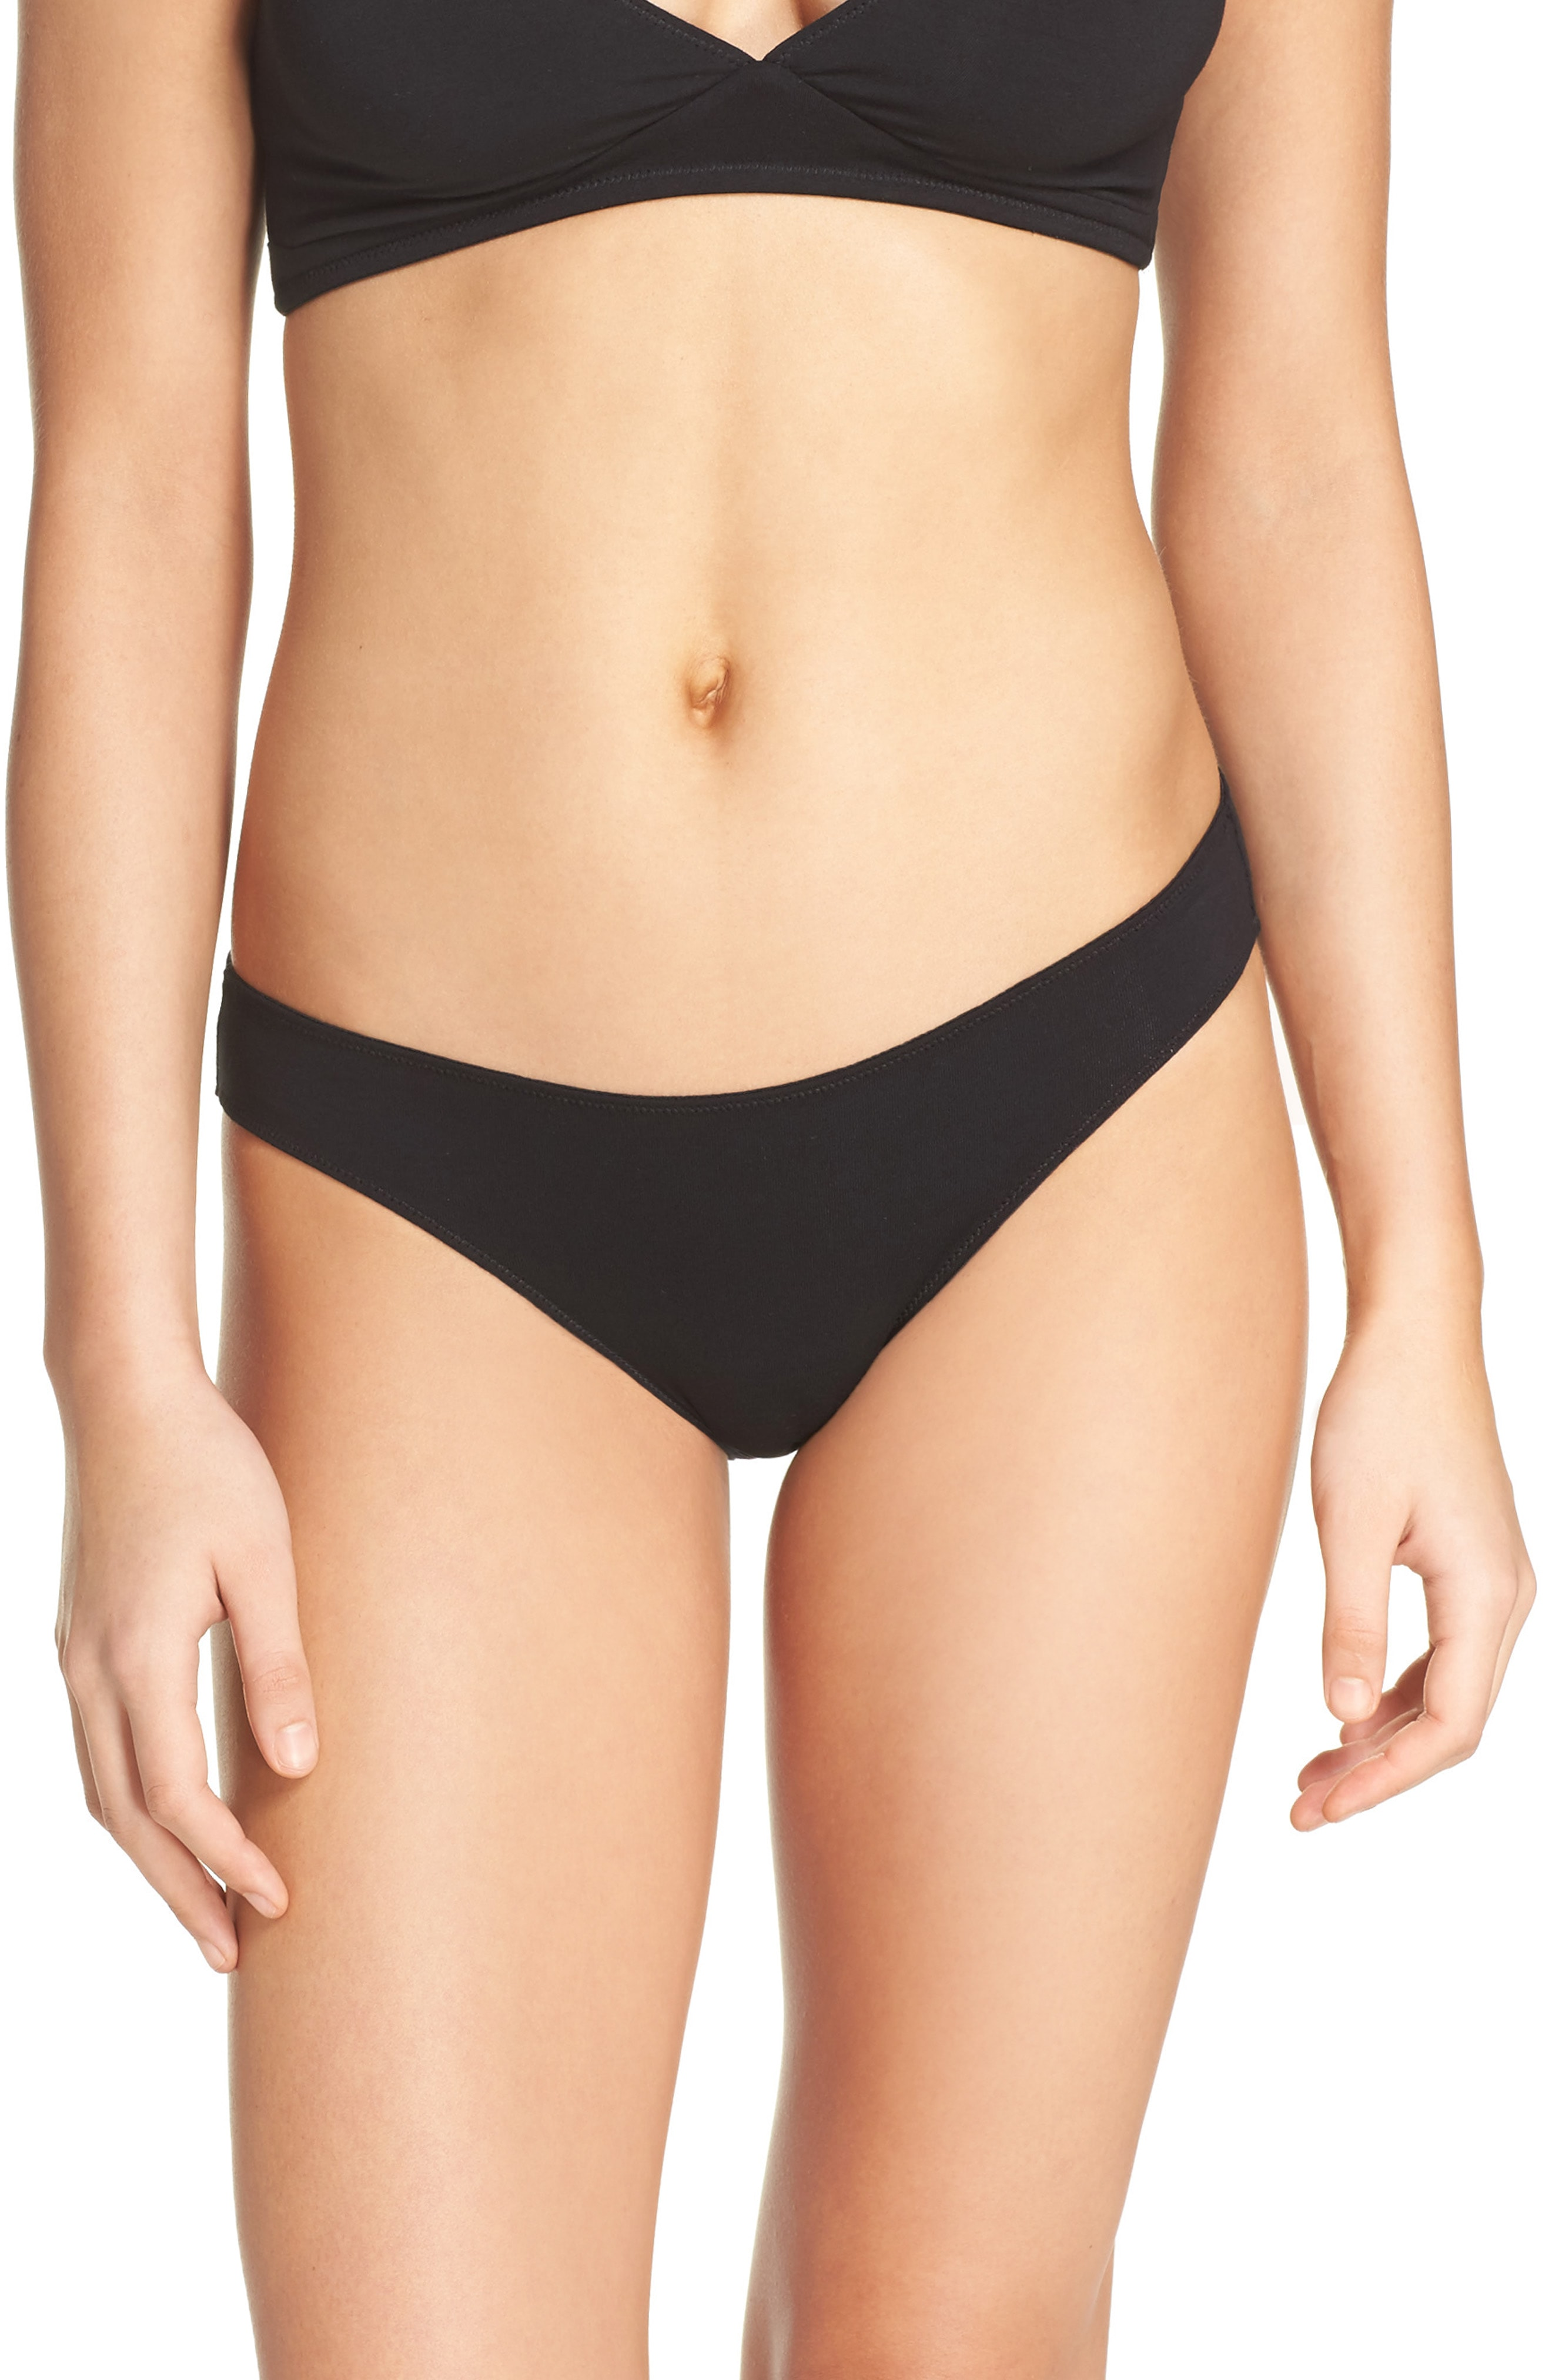 Madewell Jersey Bikini (3 for $33)